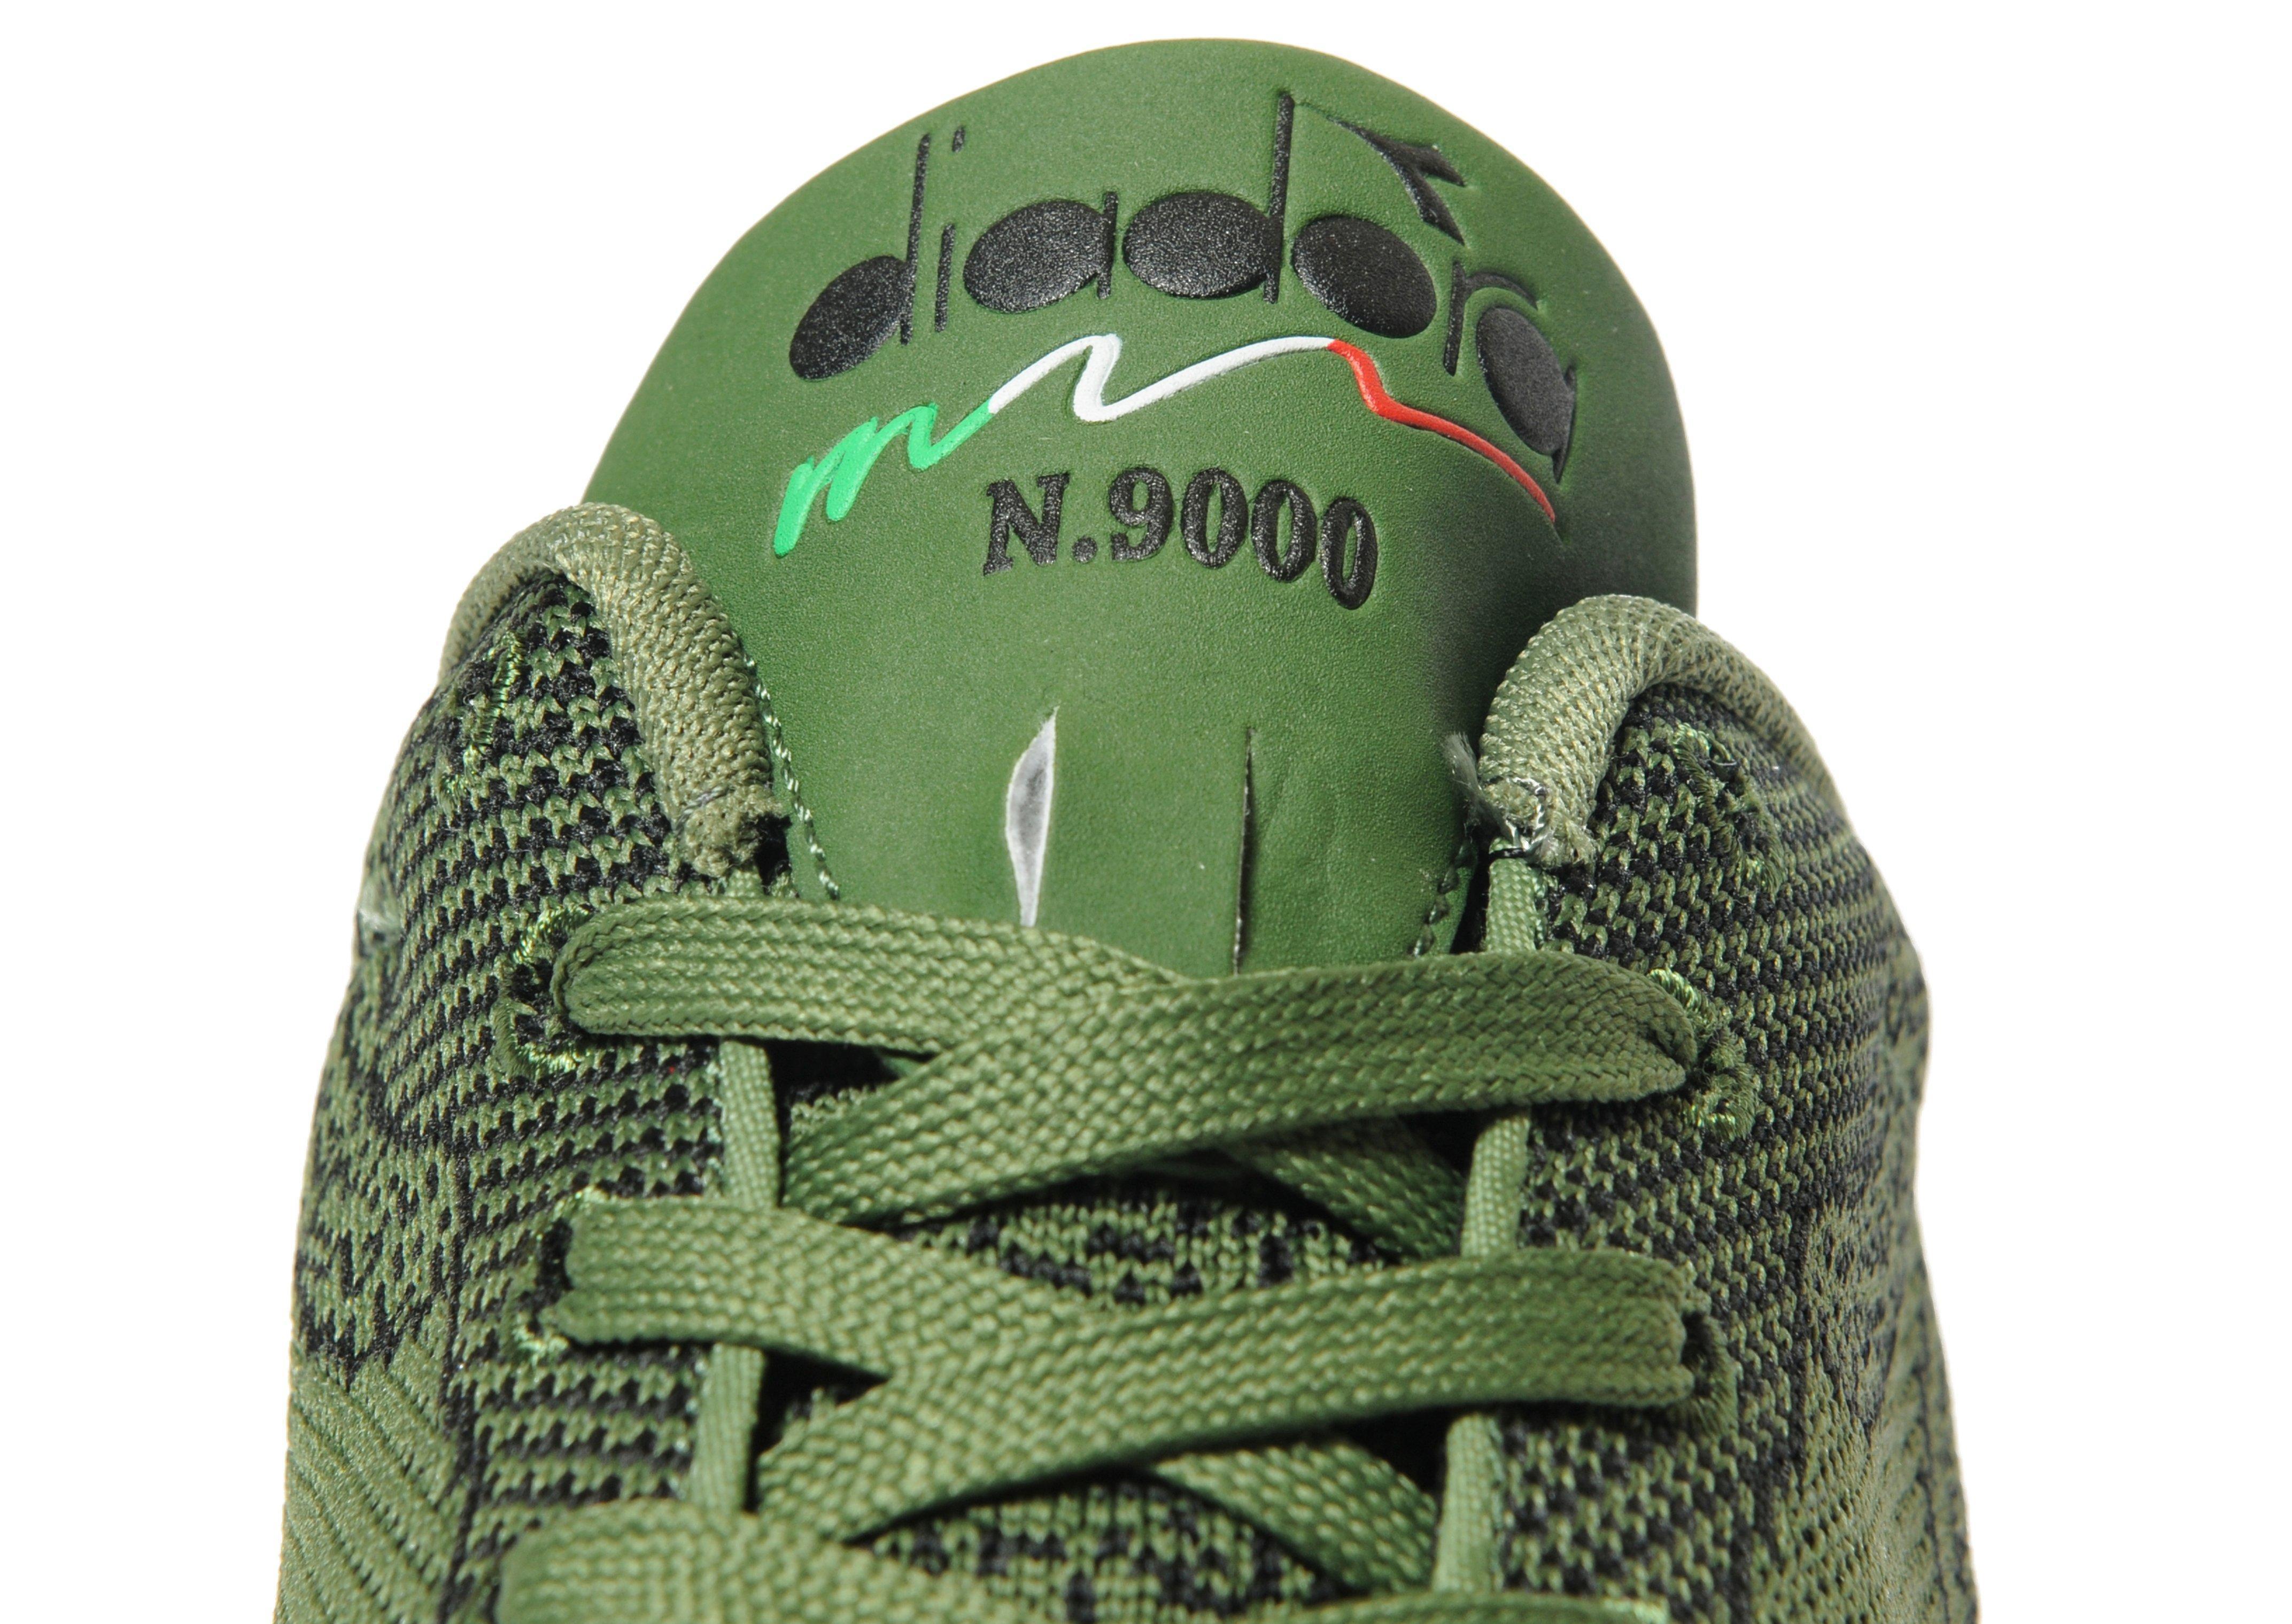 8c78ac2488 Lyst - Diadora N9000 in Green for Men